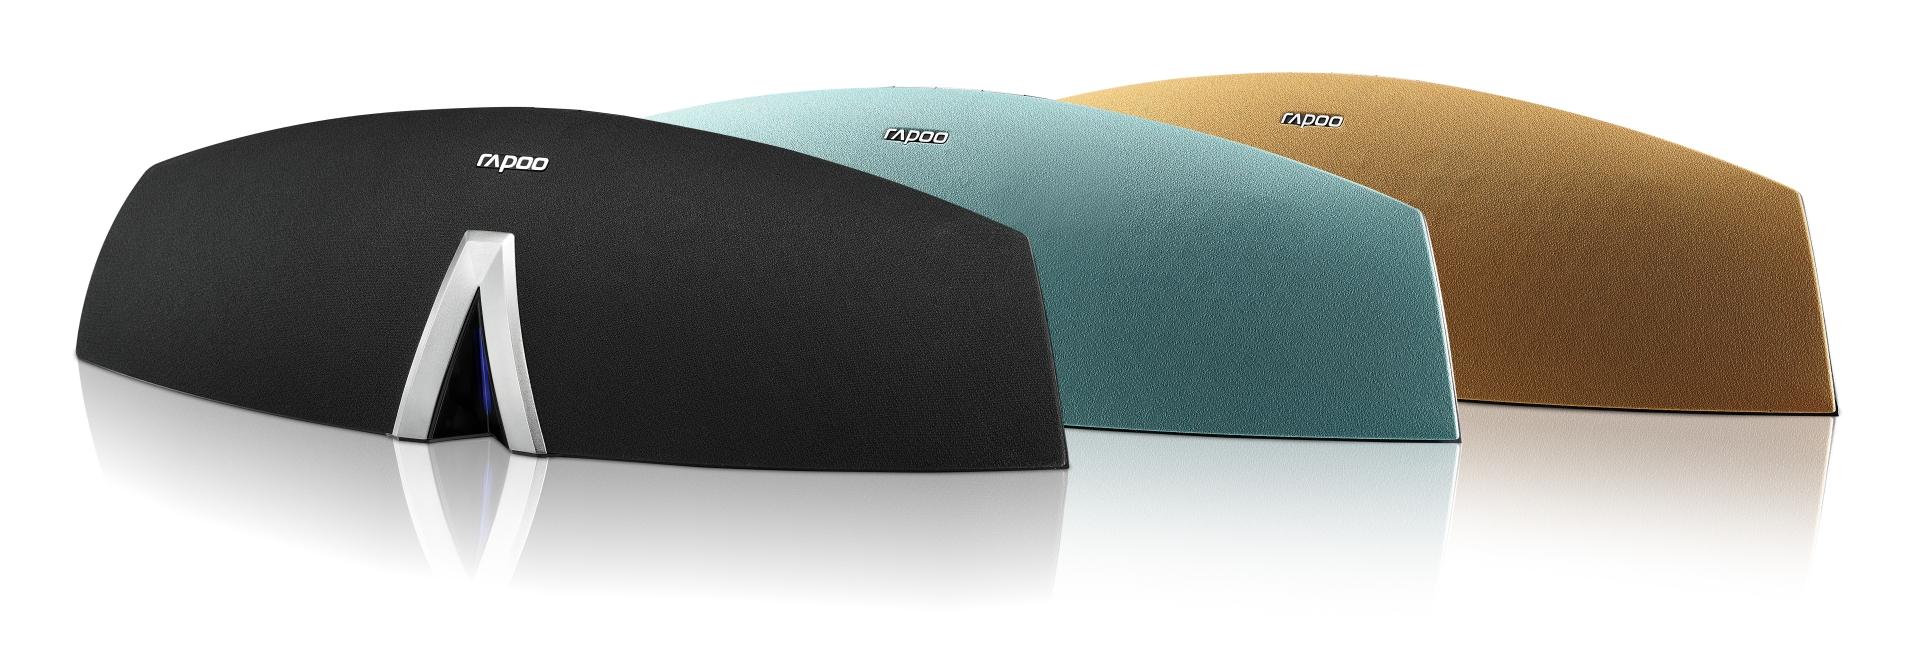 test rapoo a800 bluetooth stereo speaker allround. Black Bedroom Furniture Sets. Home Design Ideas